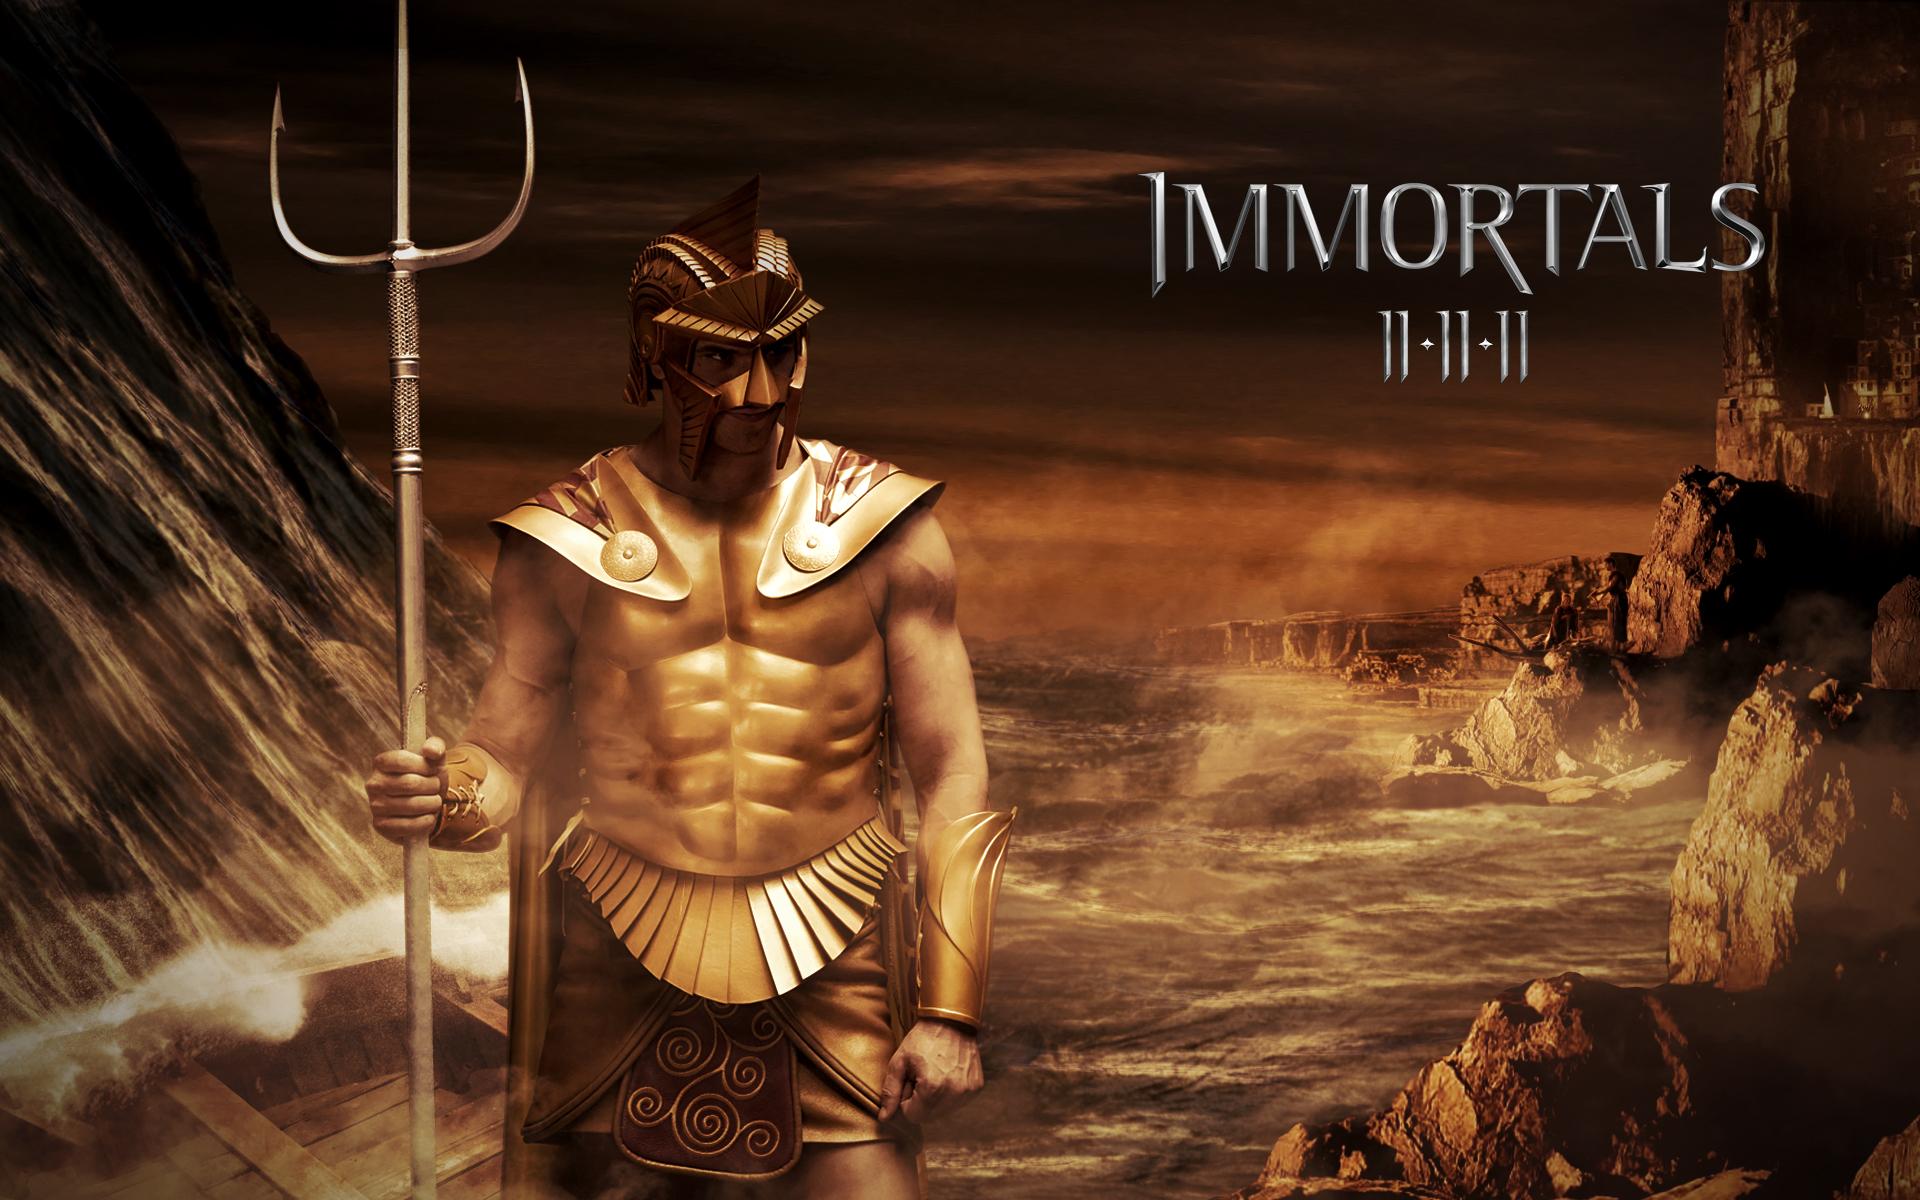 Wallpaper Inmortals